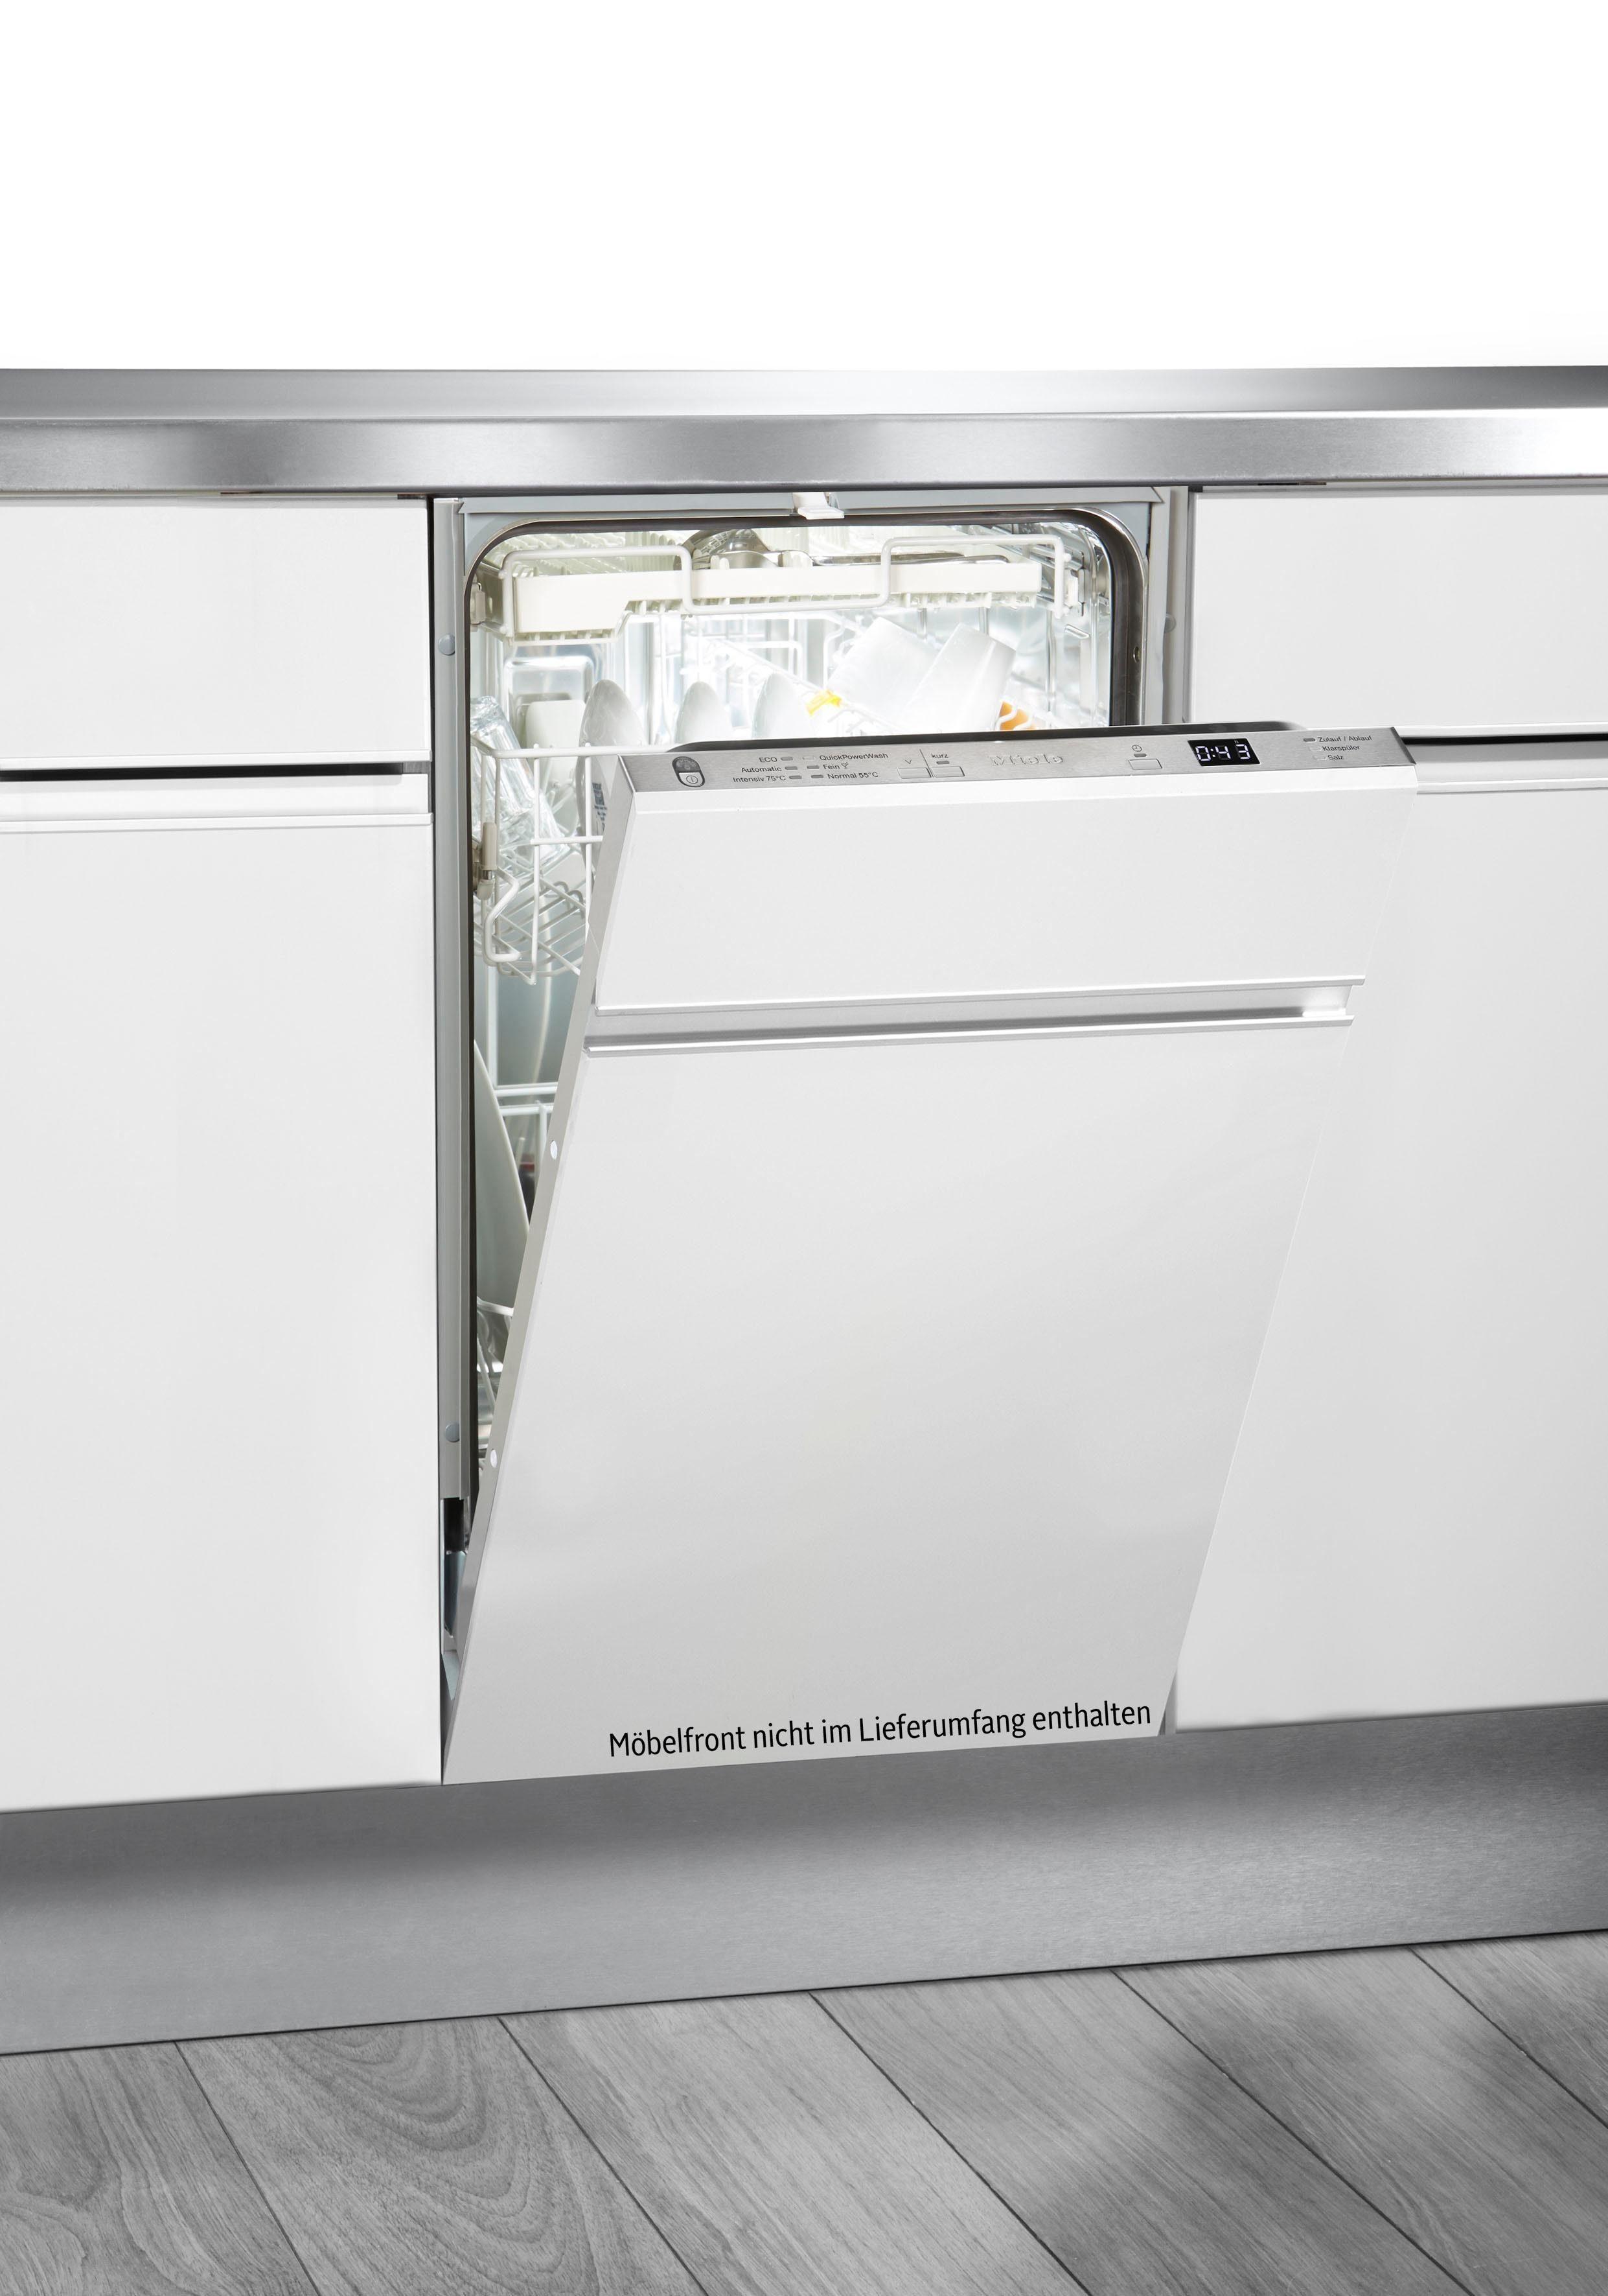 Miele vollintegrierbarer Geschirrspüler, G 4782 SCVi, 0,87 l, 9 Maßgedecke, 45 cm breit